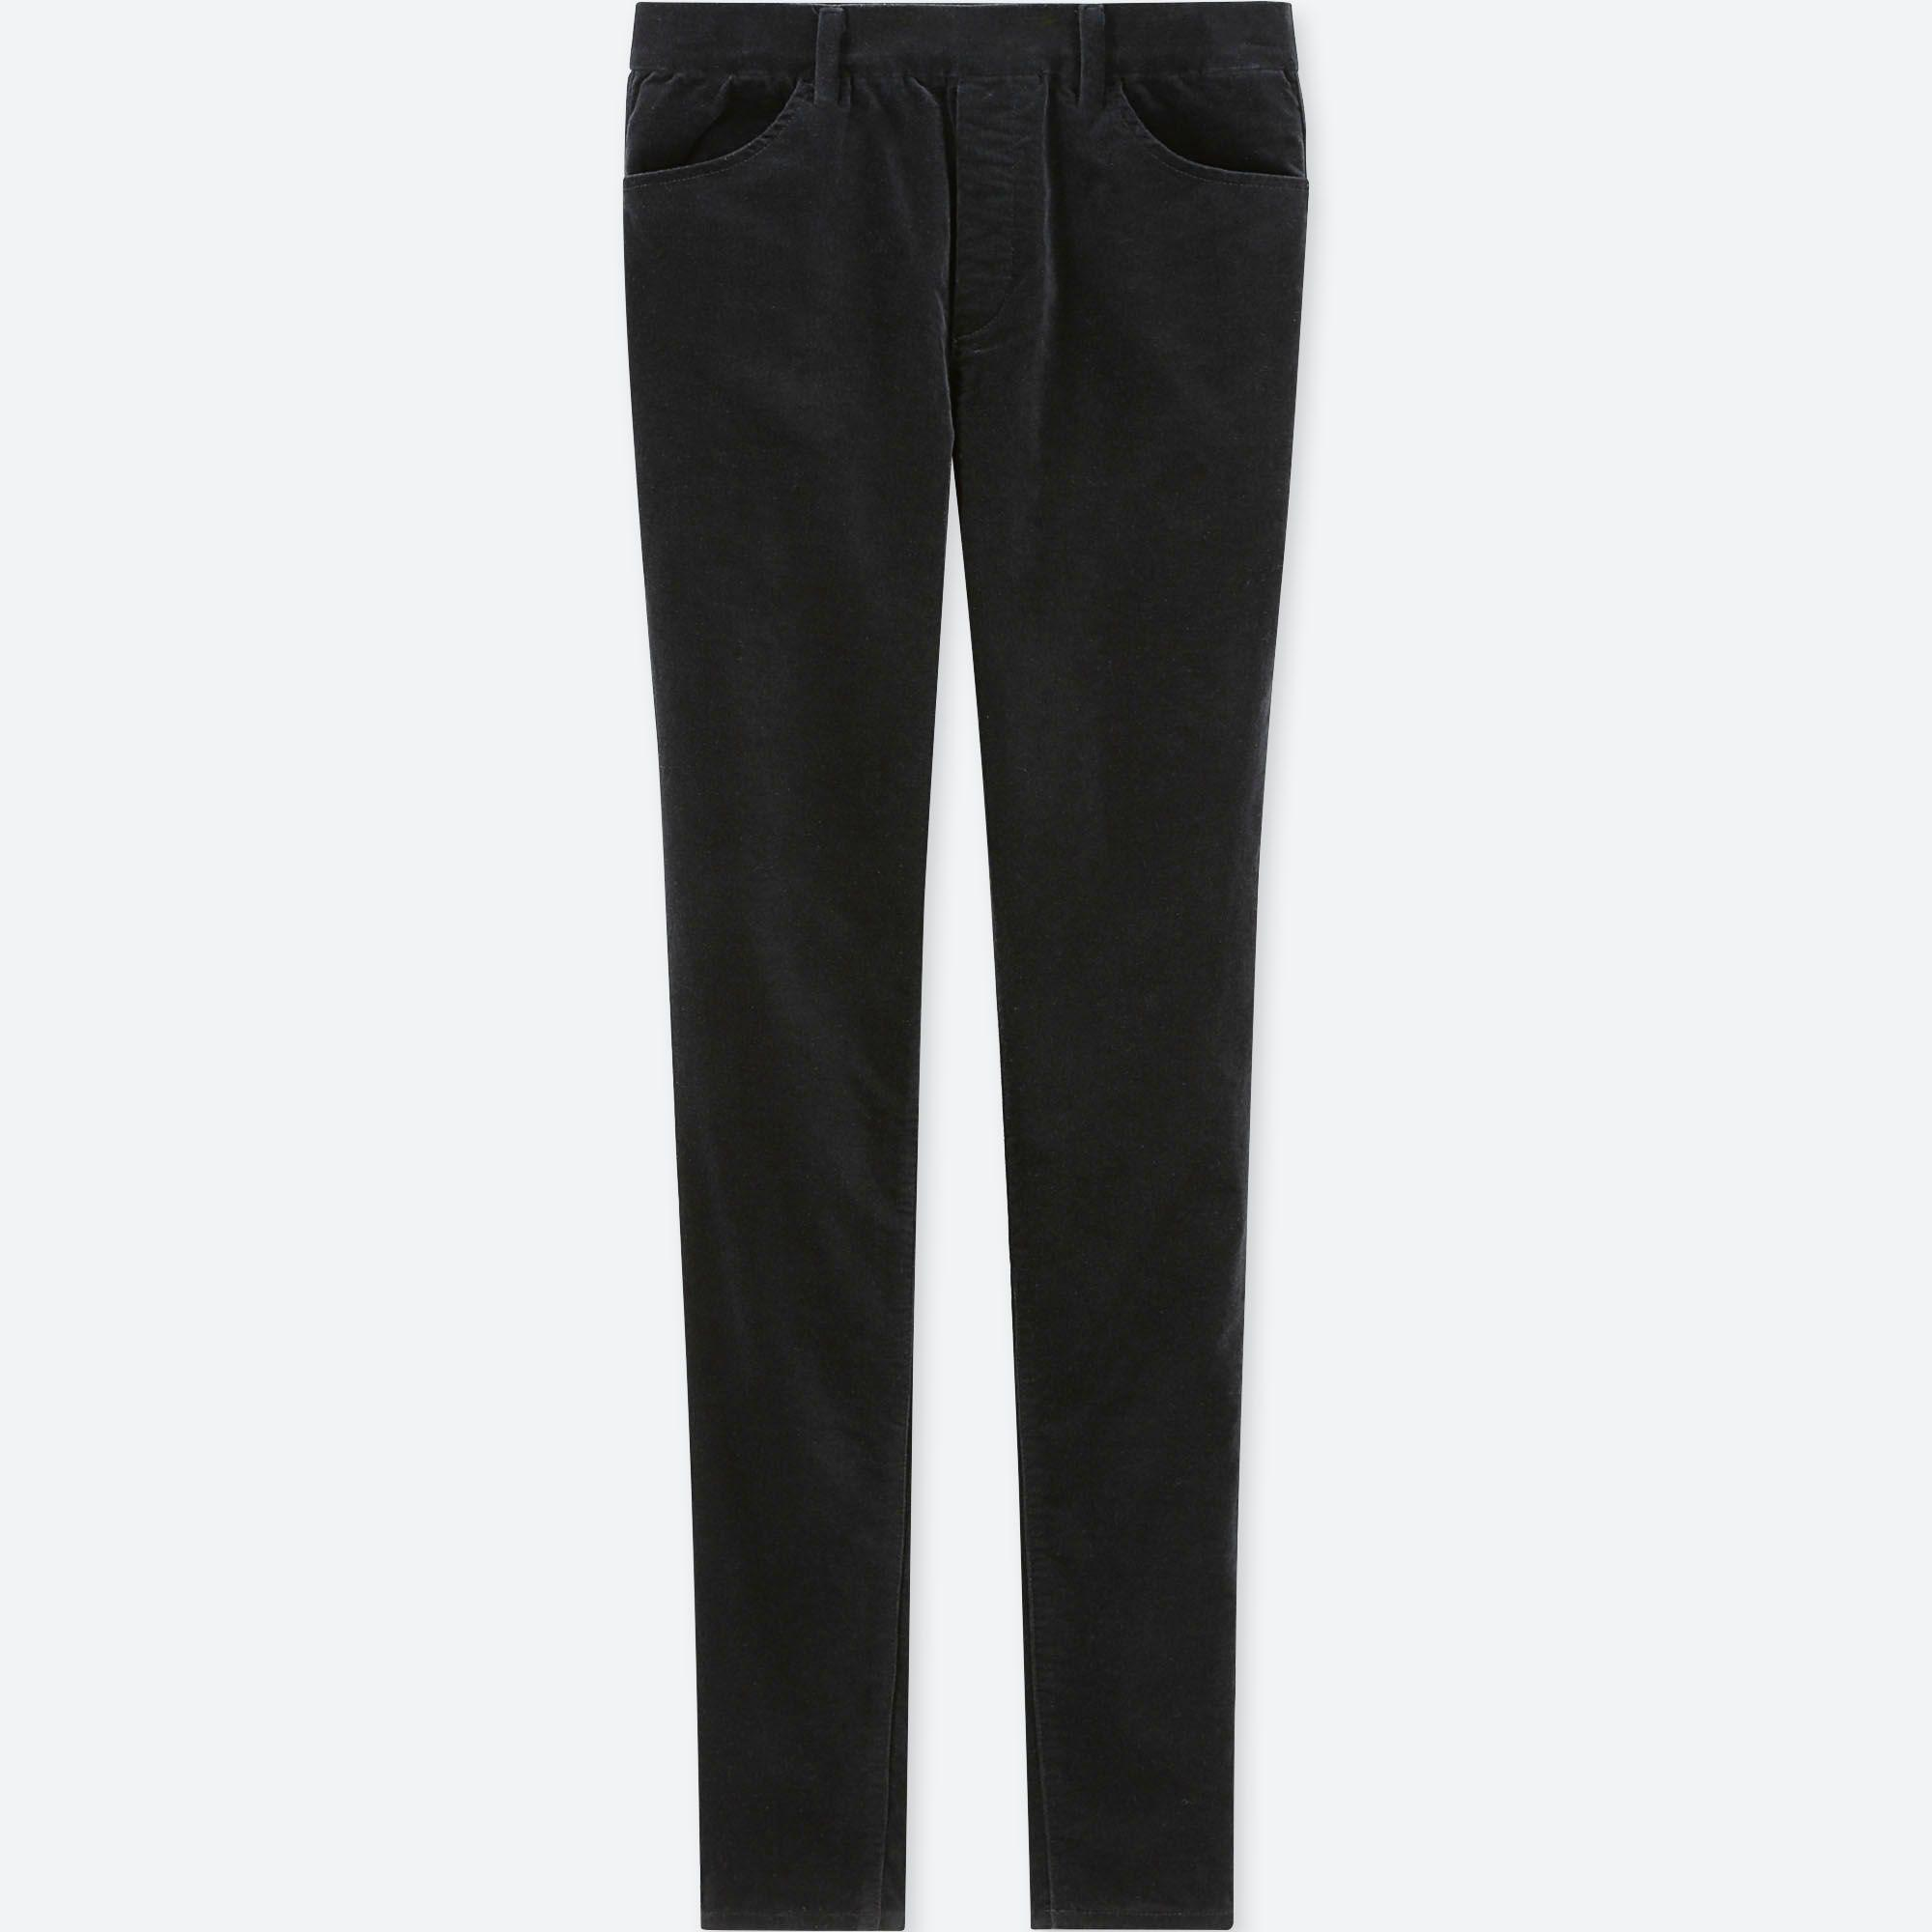 0c9d86fbfaccf0 Uniqlo Heattech Velvet High Rise LEGGINGS Trousers in Black - Lyst